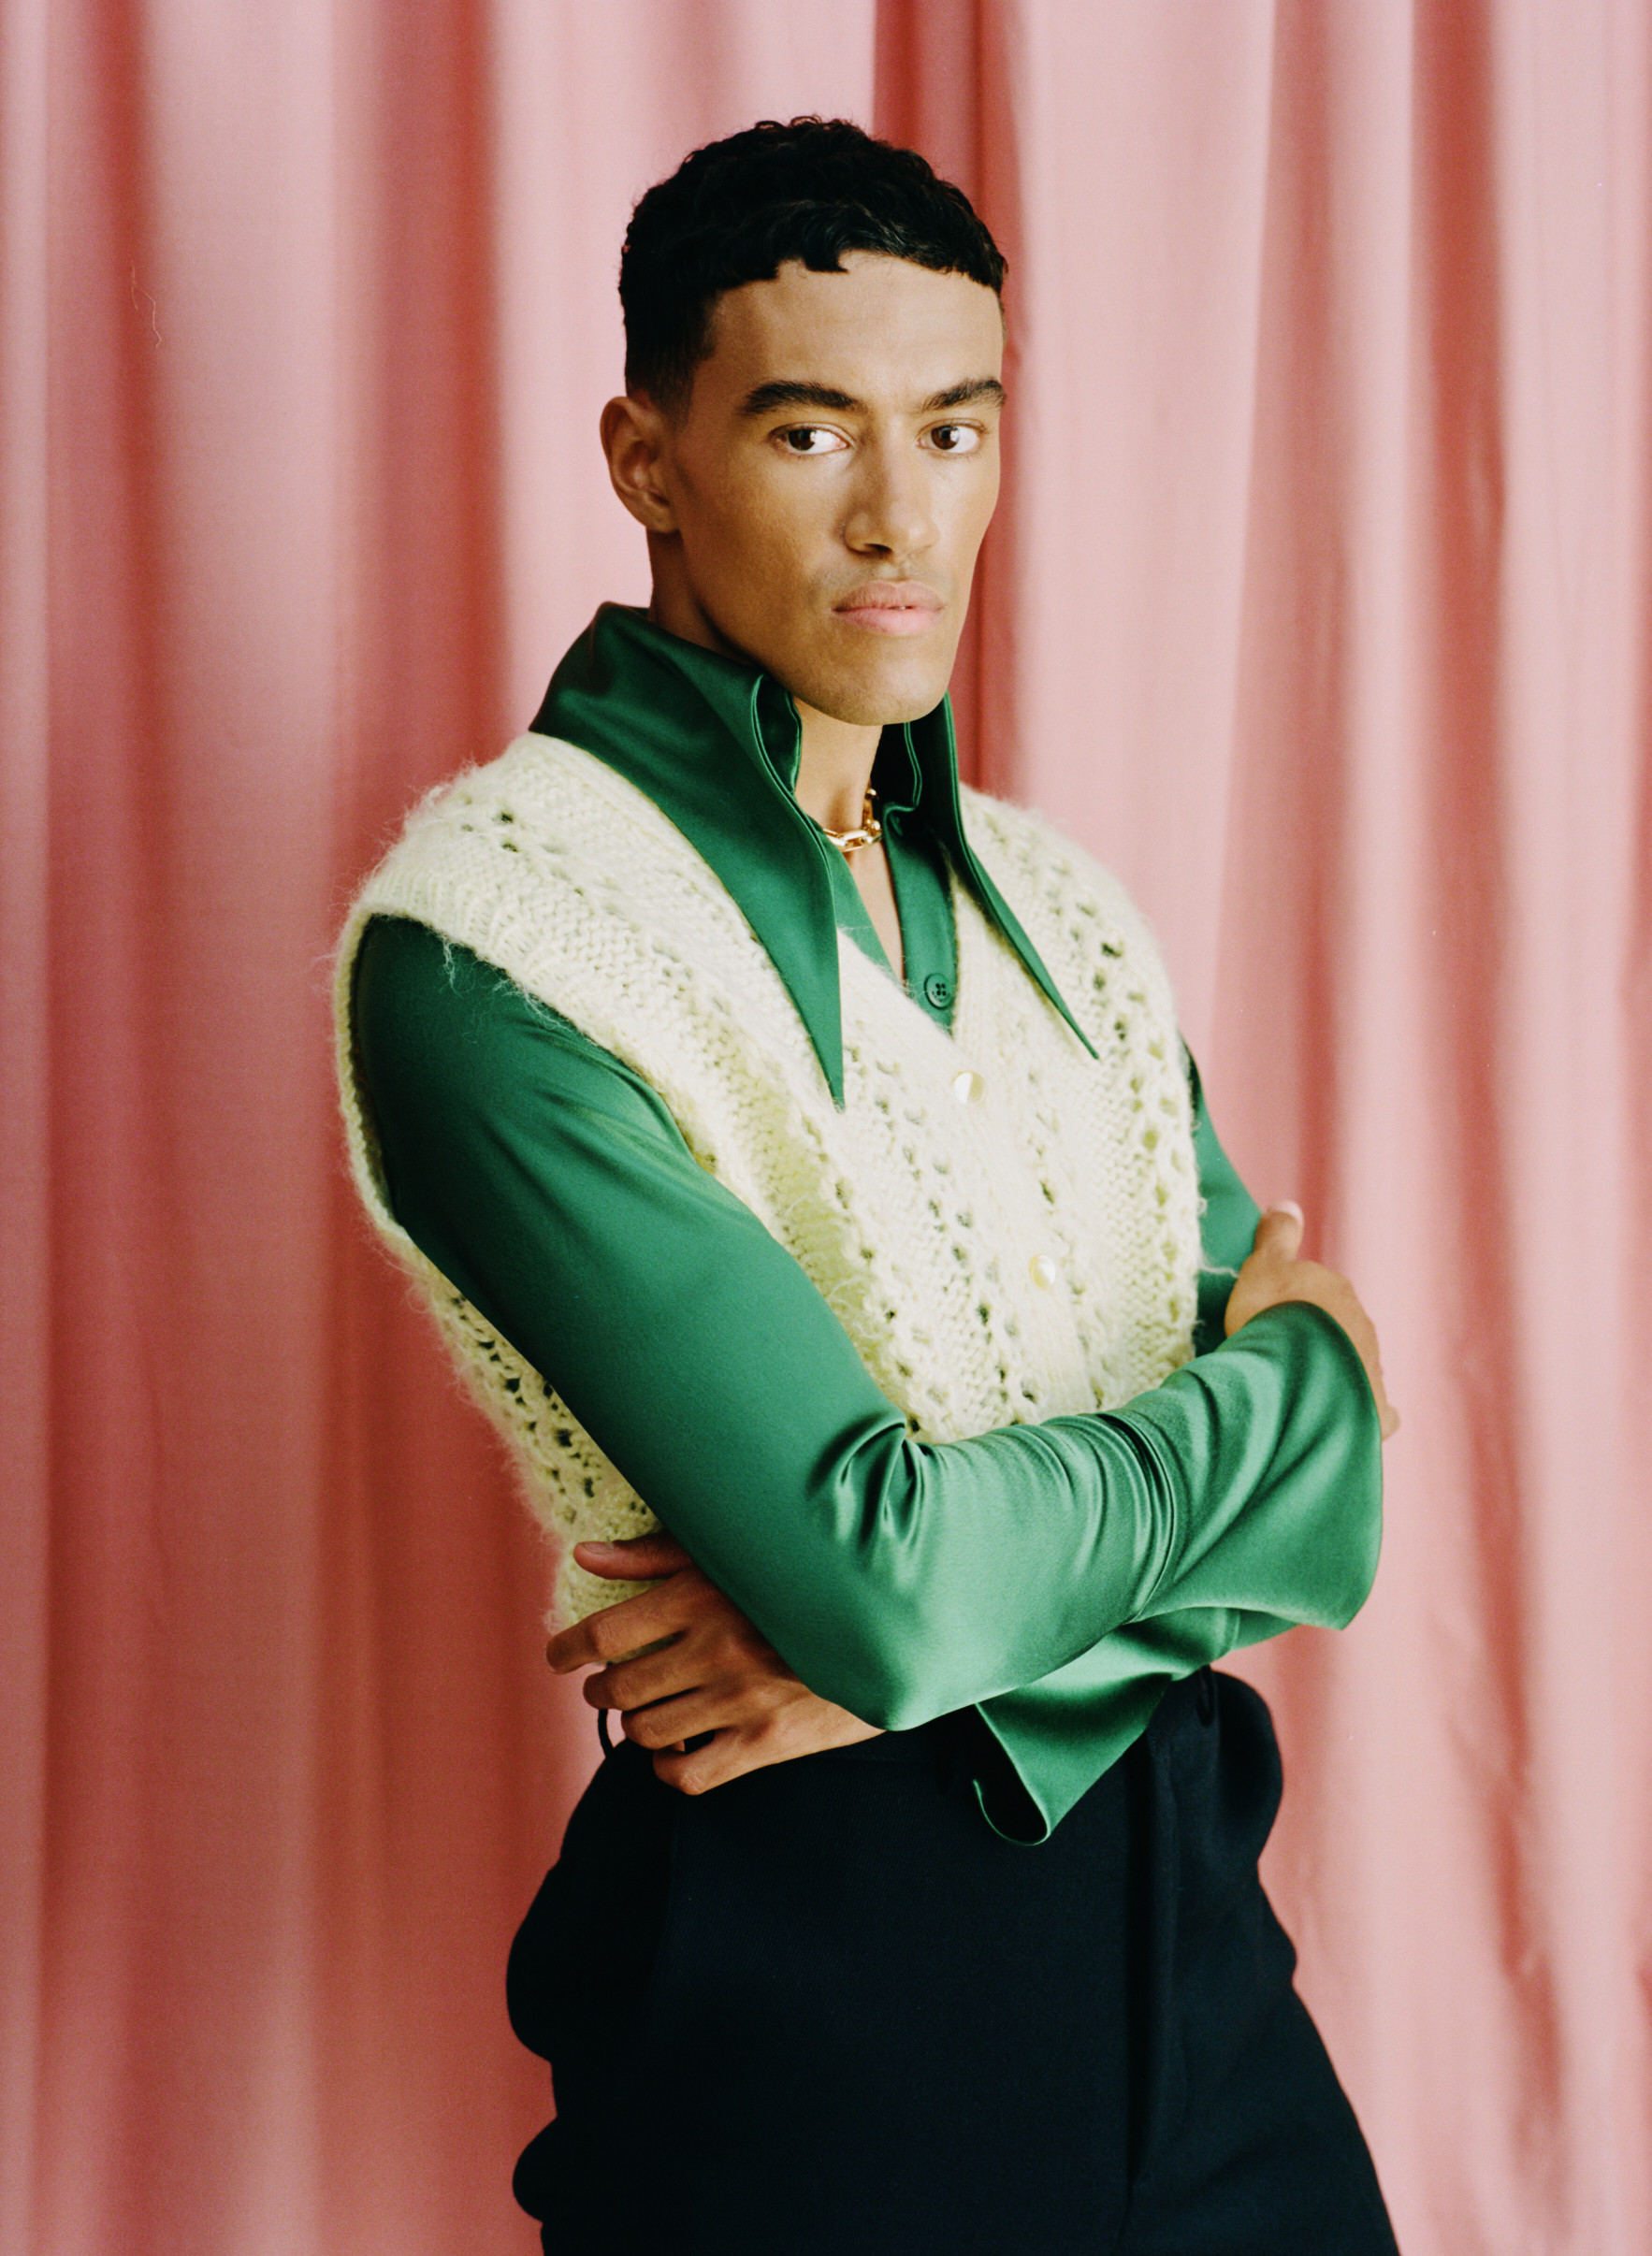 Shirt: 16Arlington Vest: Repsycho Vintage Trousers: Tod's Shoes: Tod's Necklace: Stylist's own